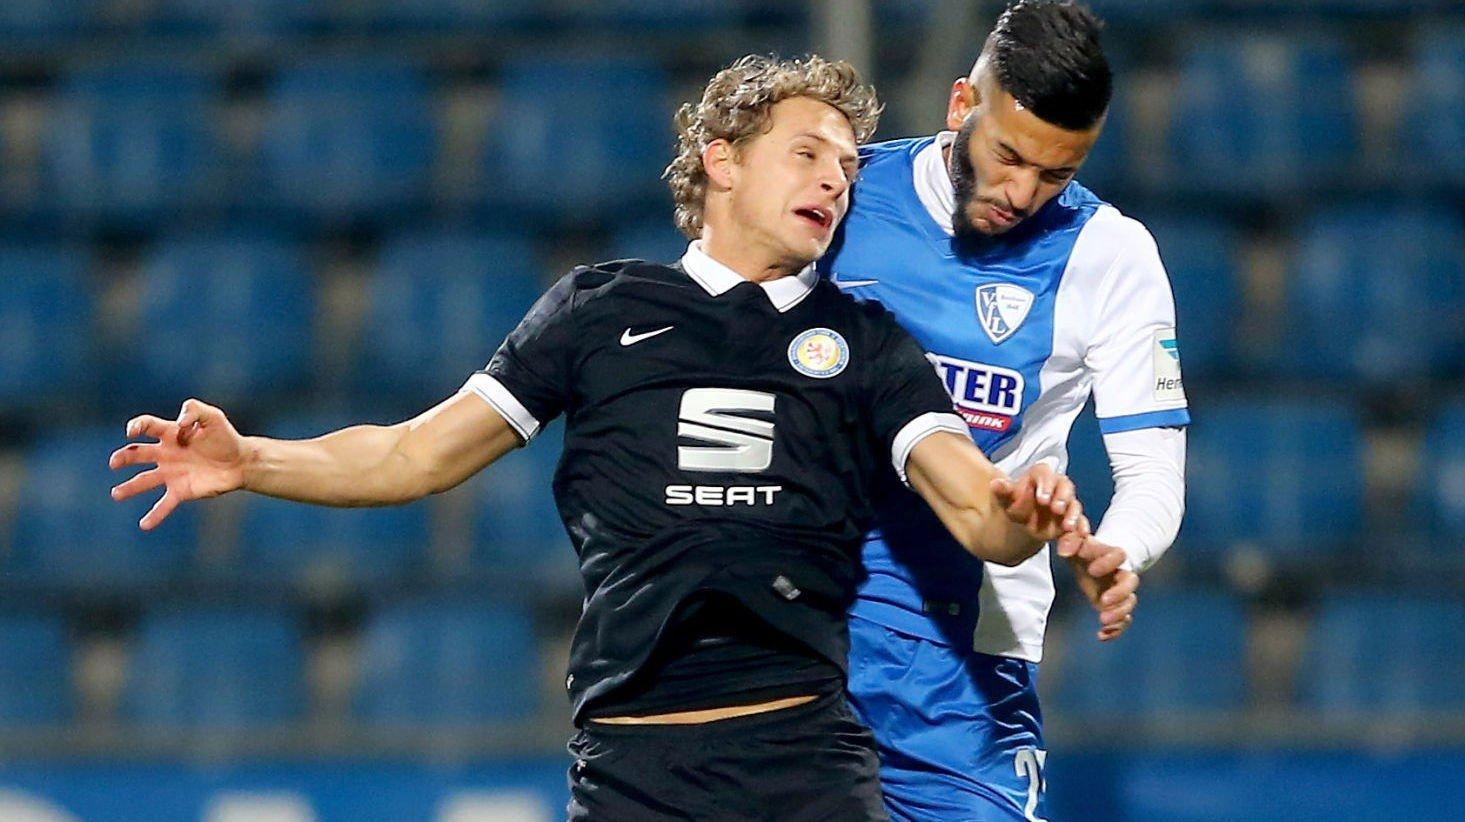 TAP: Vegar Eggen Hedenstad og Eintracht Braunschweig tapte 3-2 mot Bochum og Selim Guenduez fredag.